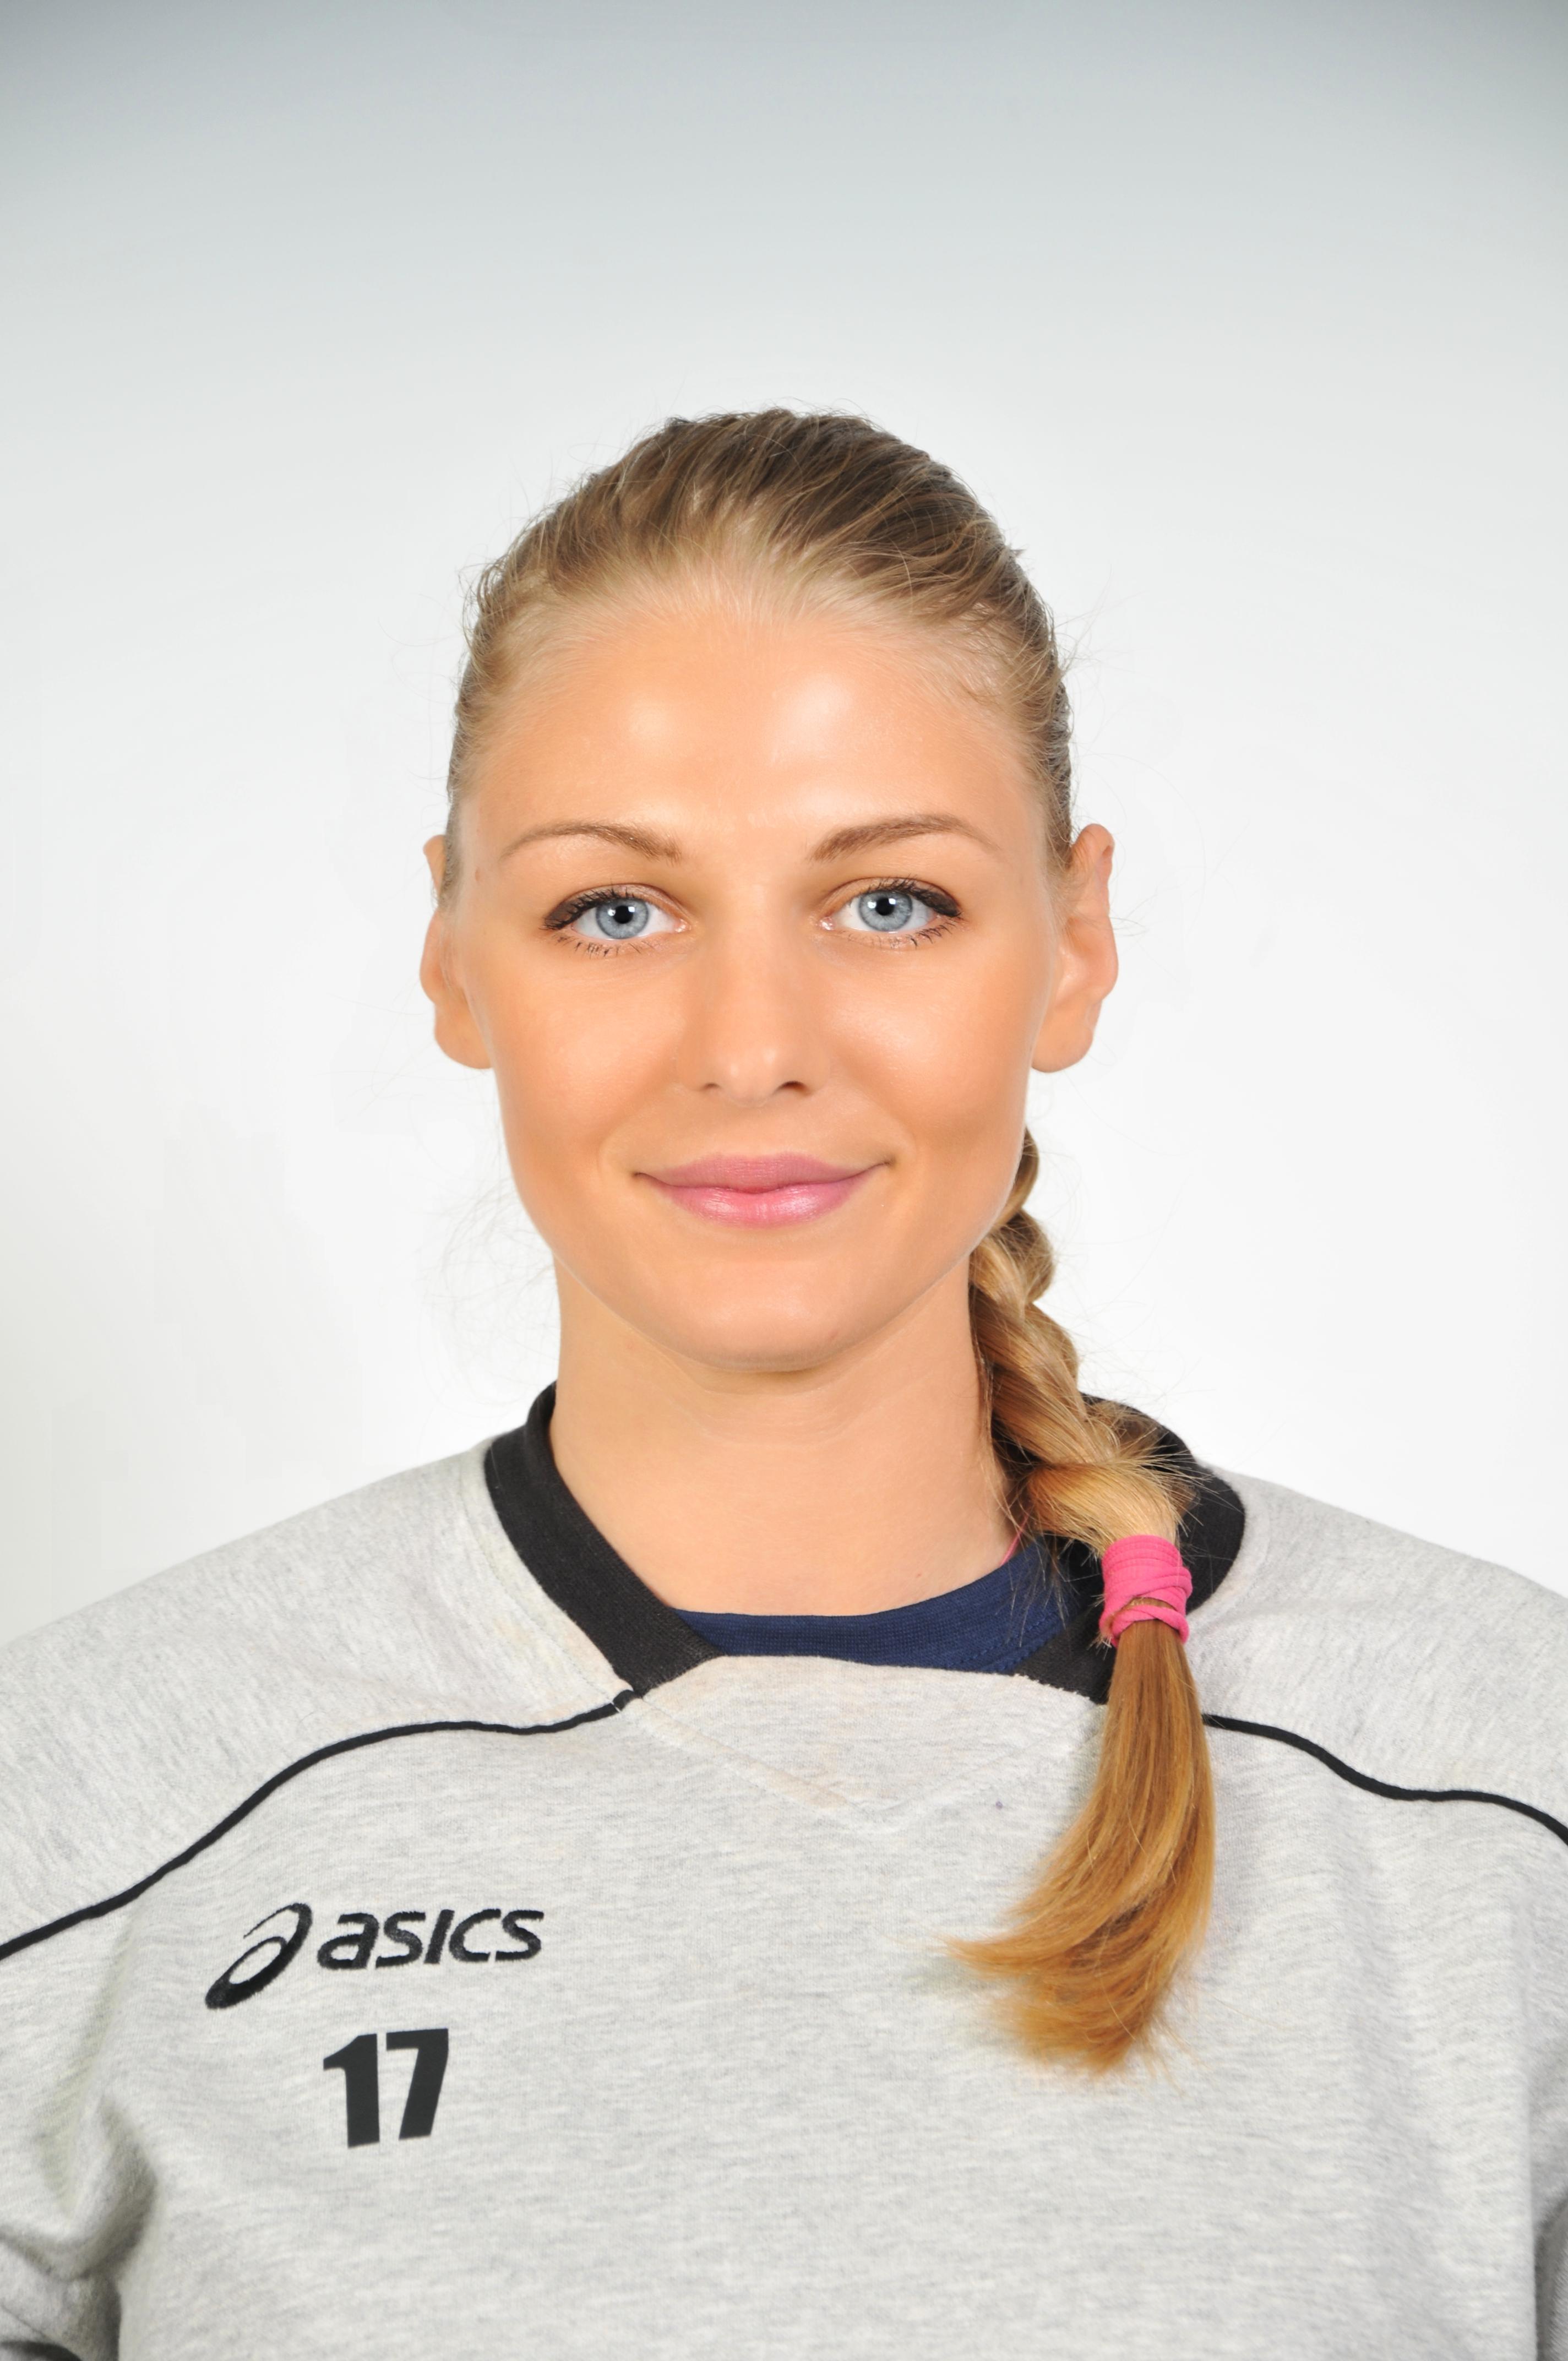 Strashimira Strashimirova Simeonova